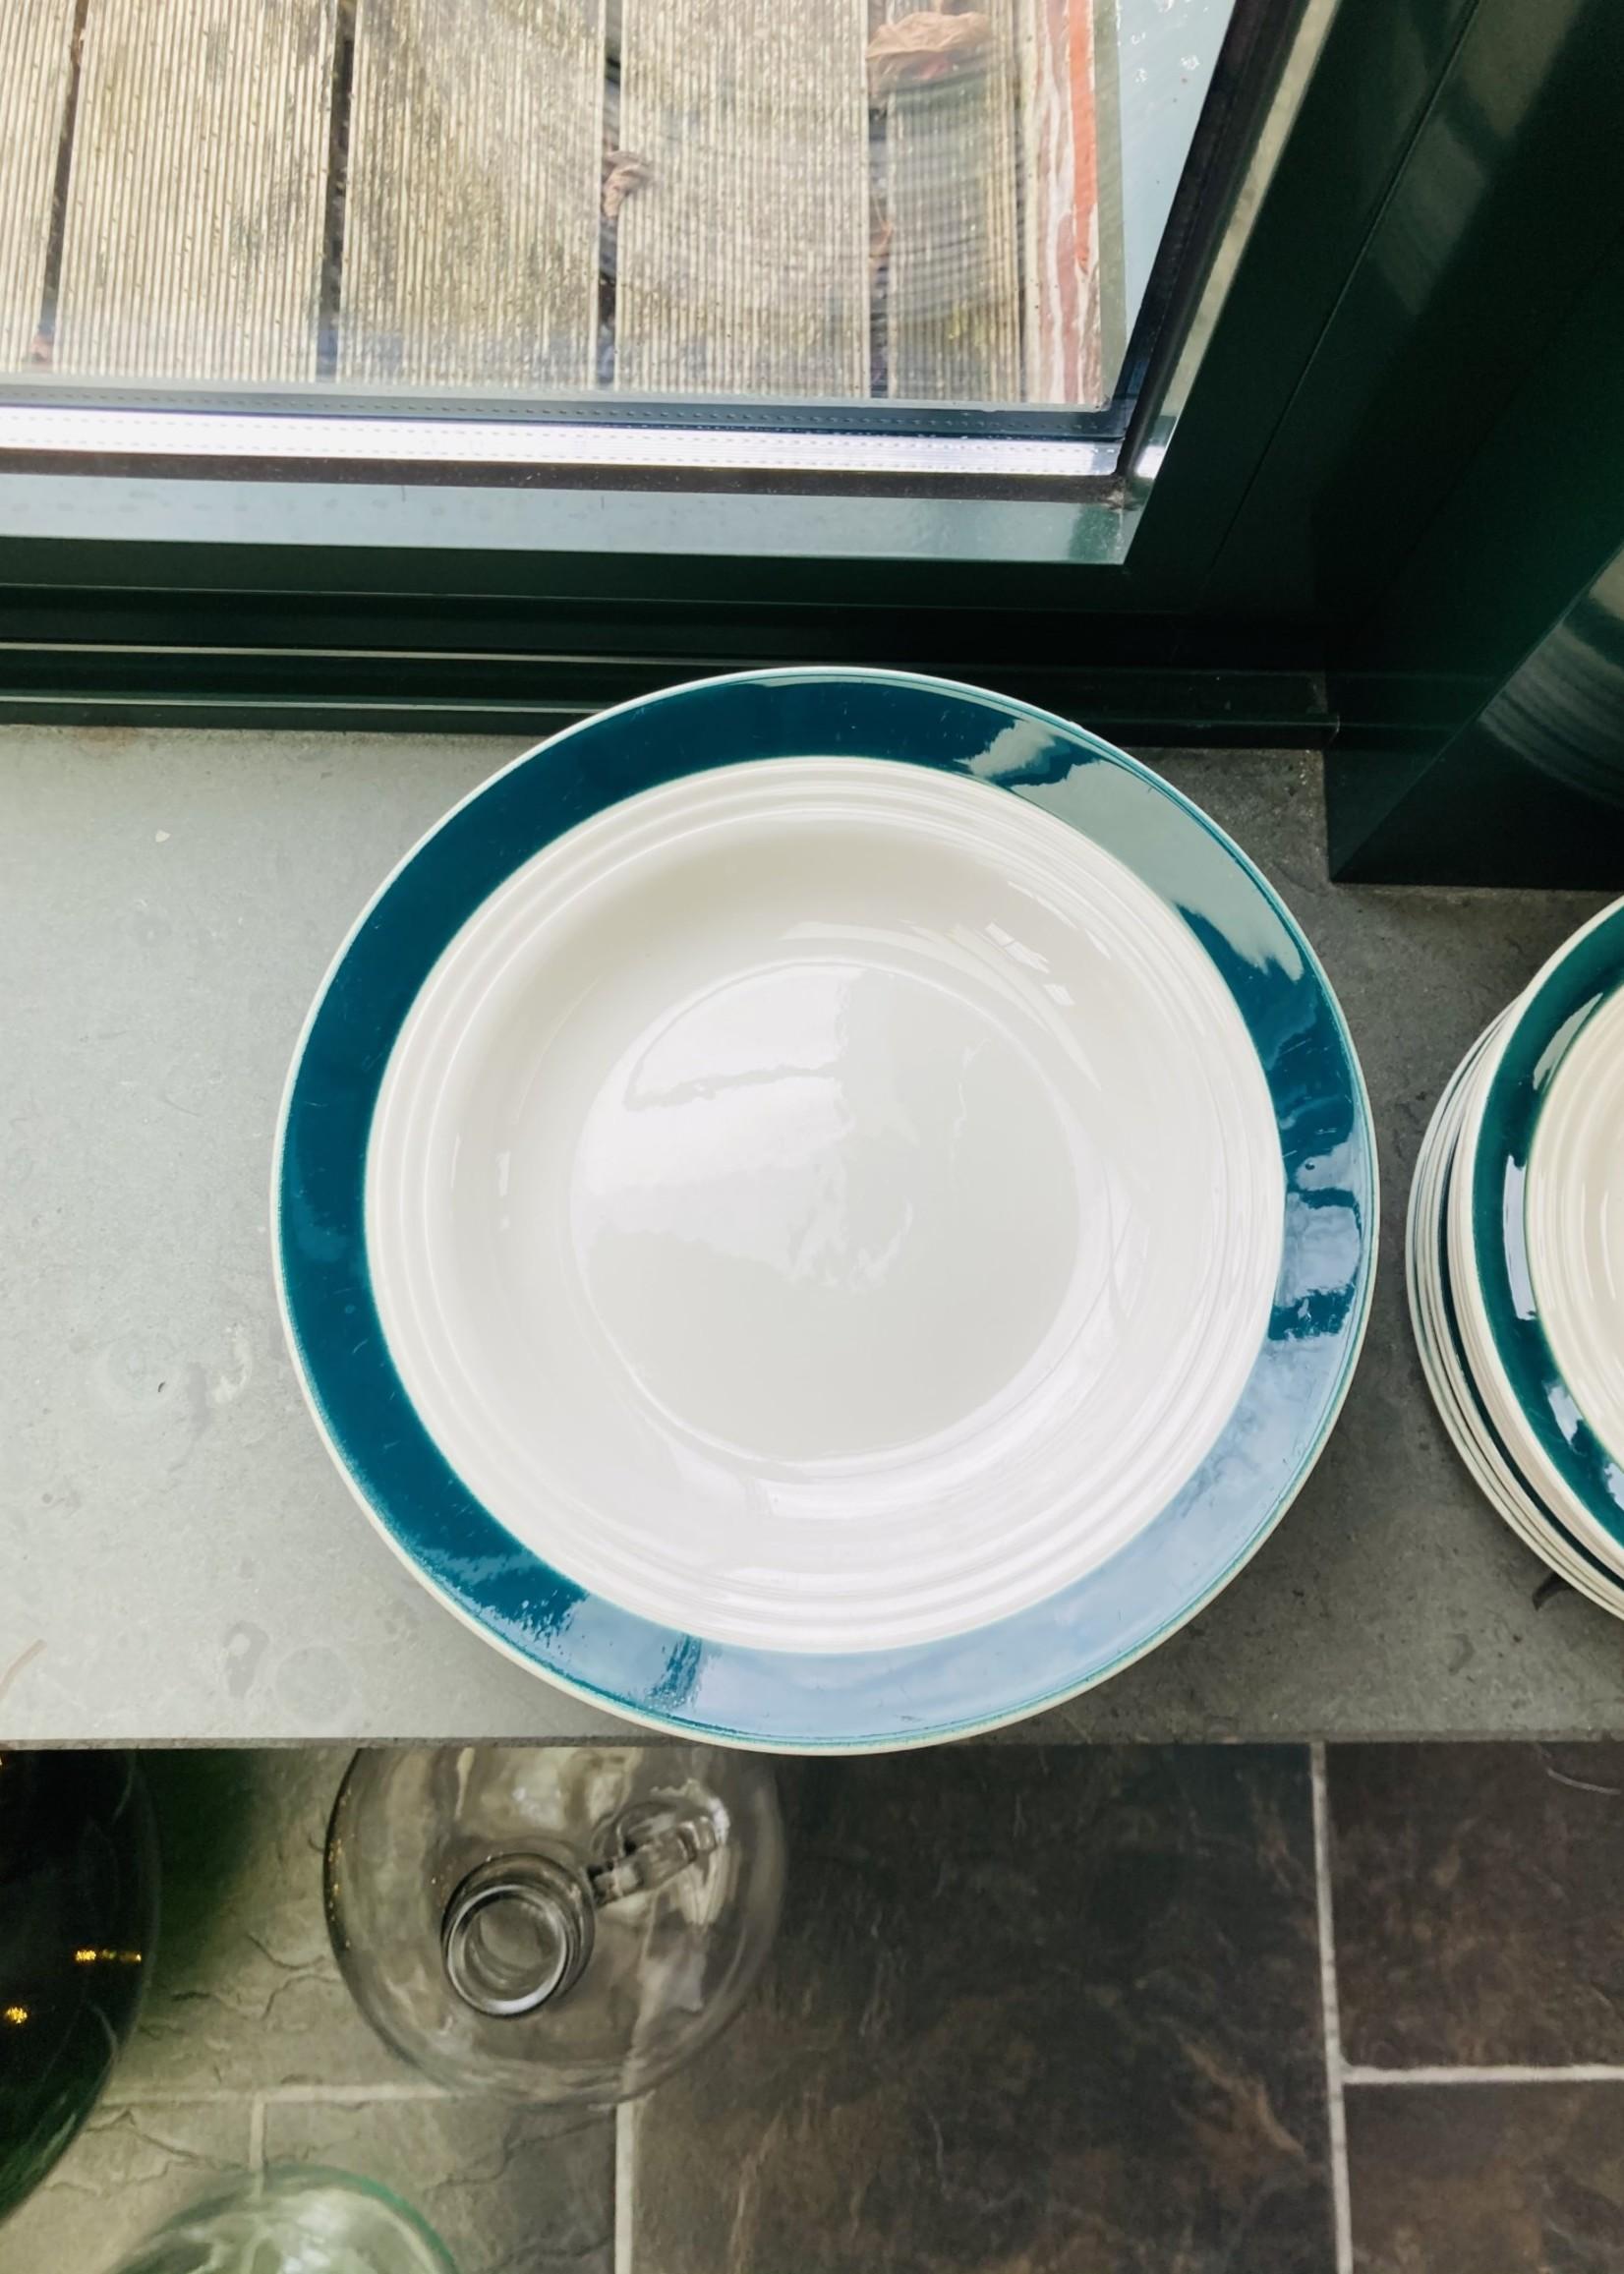 Art Deco semi-porcelain soup plates Ceranord with green rim